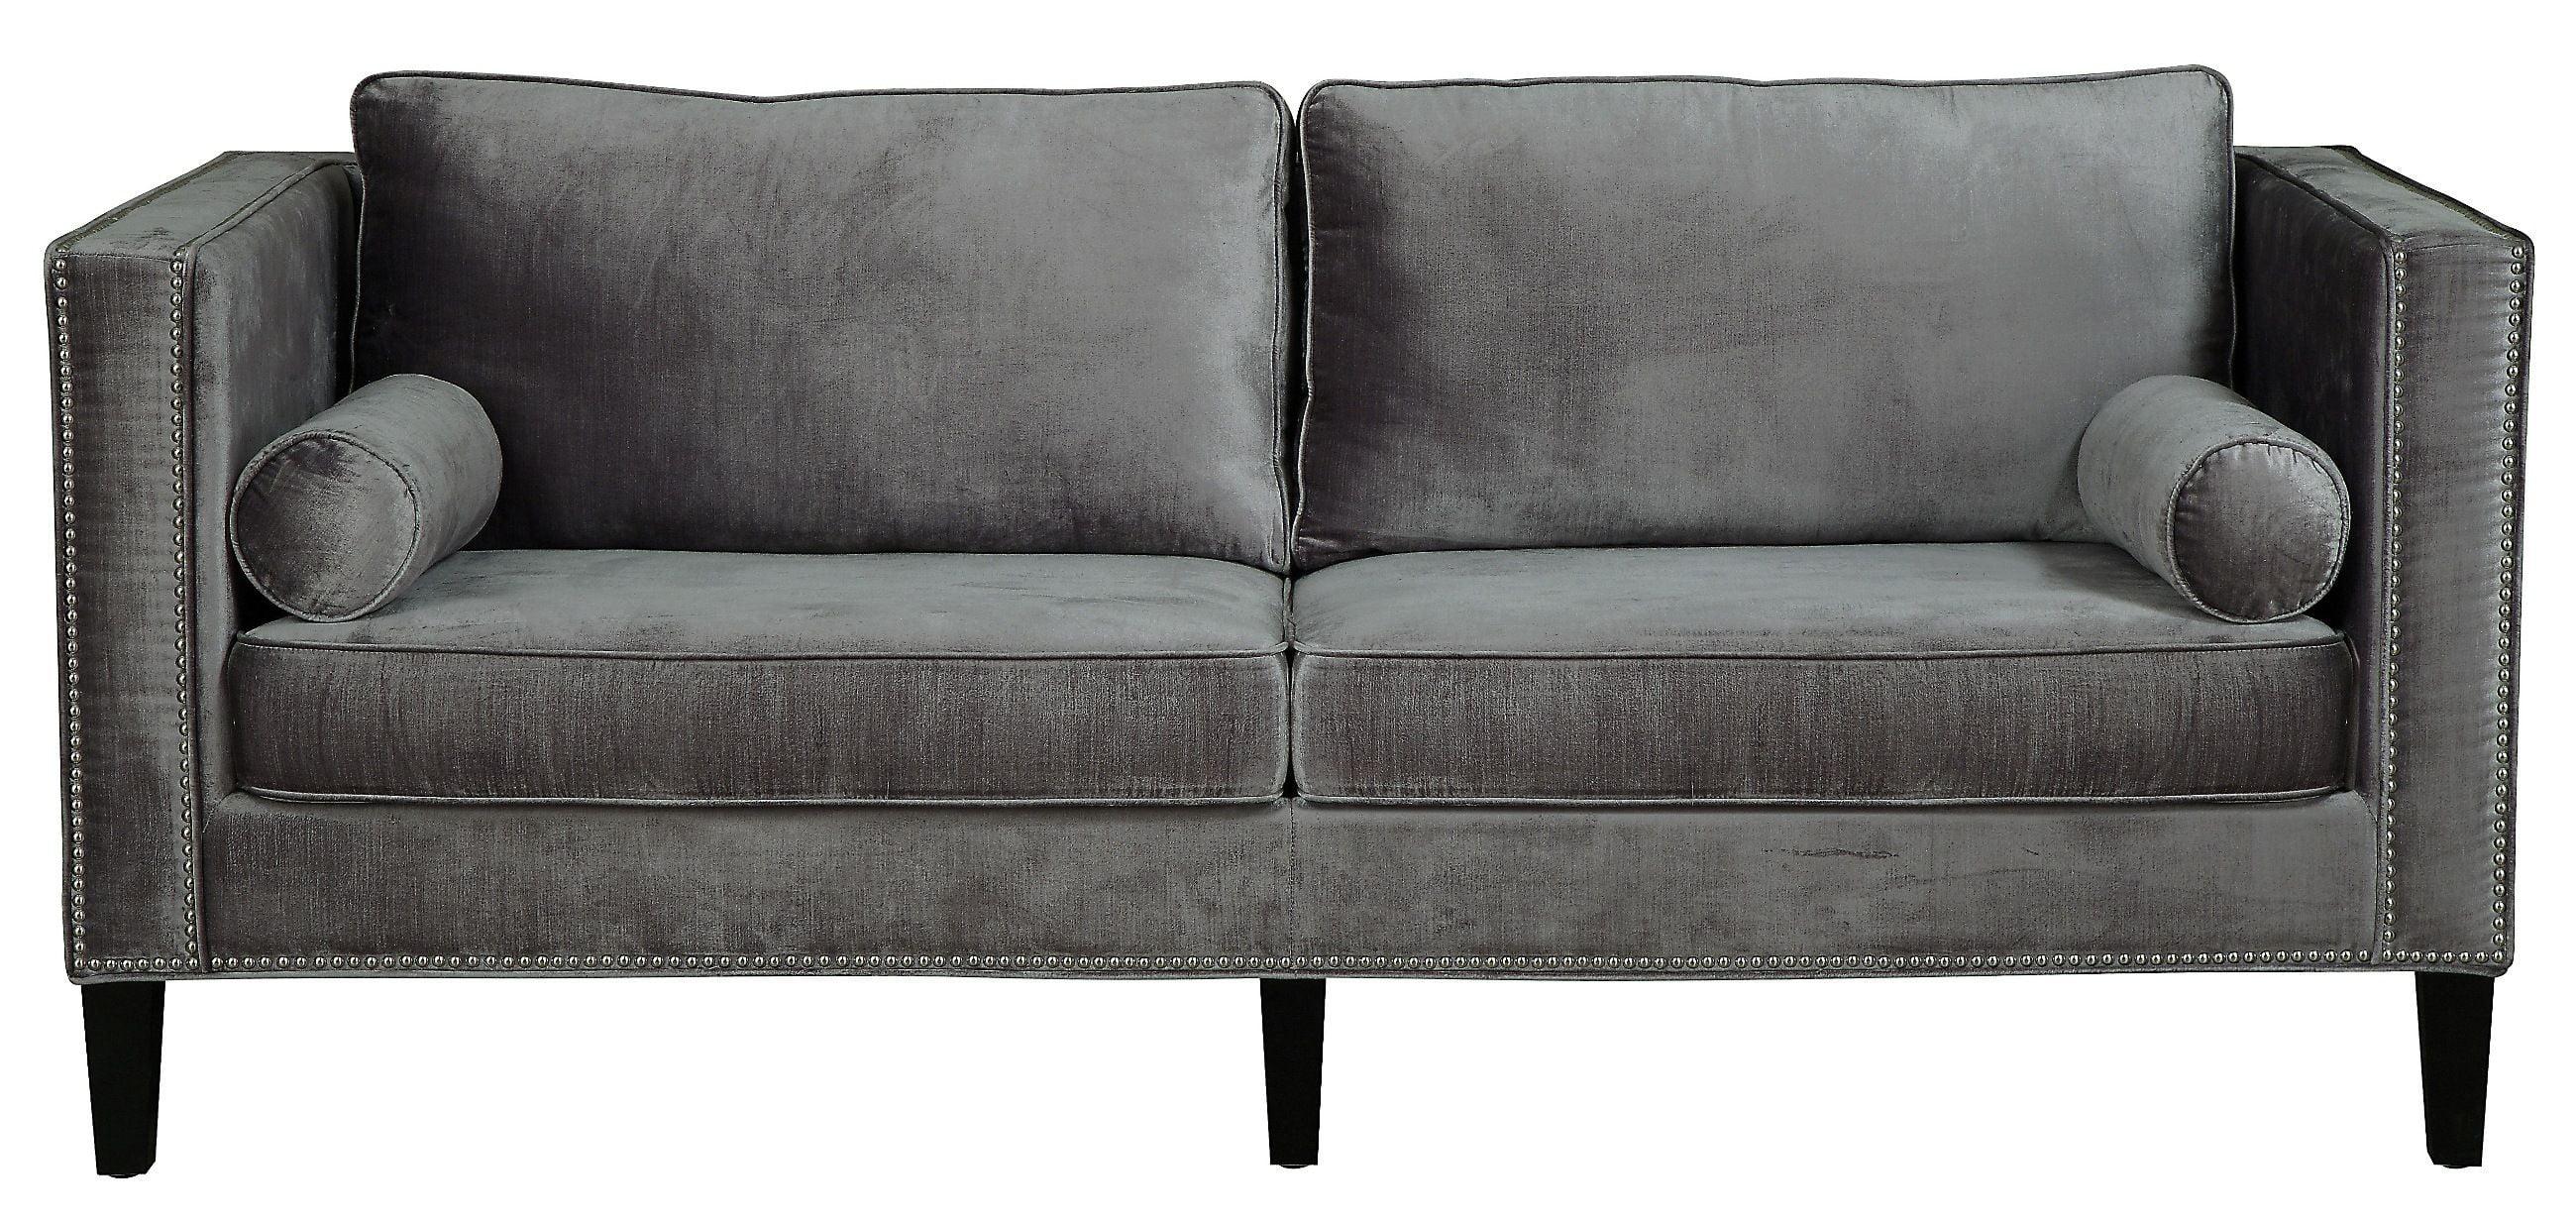 Cooper Grey Velvet Sofa From Tov S29 Coleman Furniture